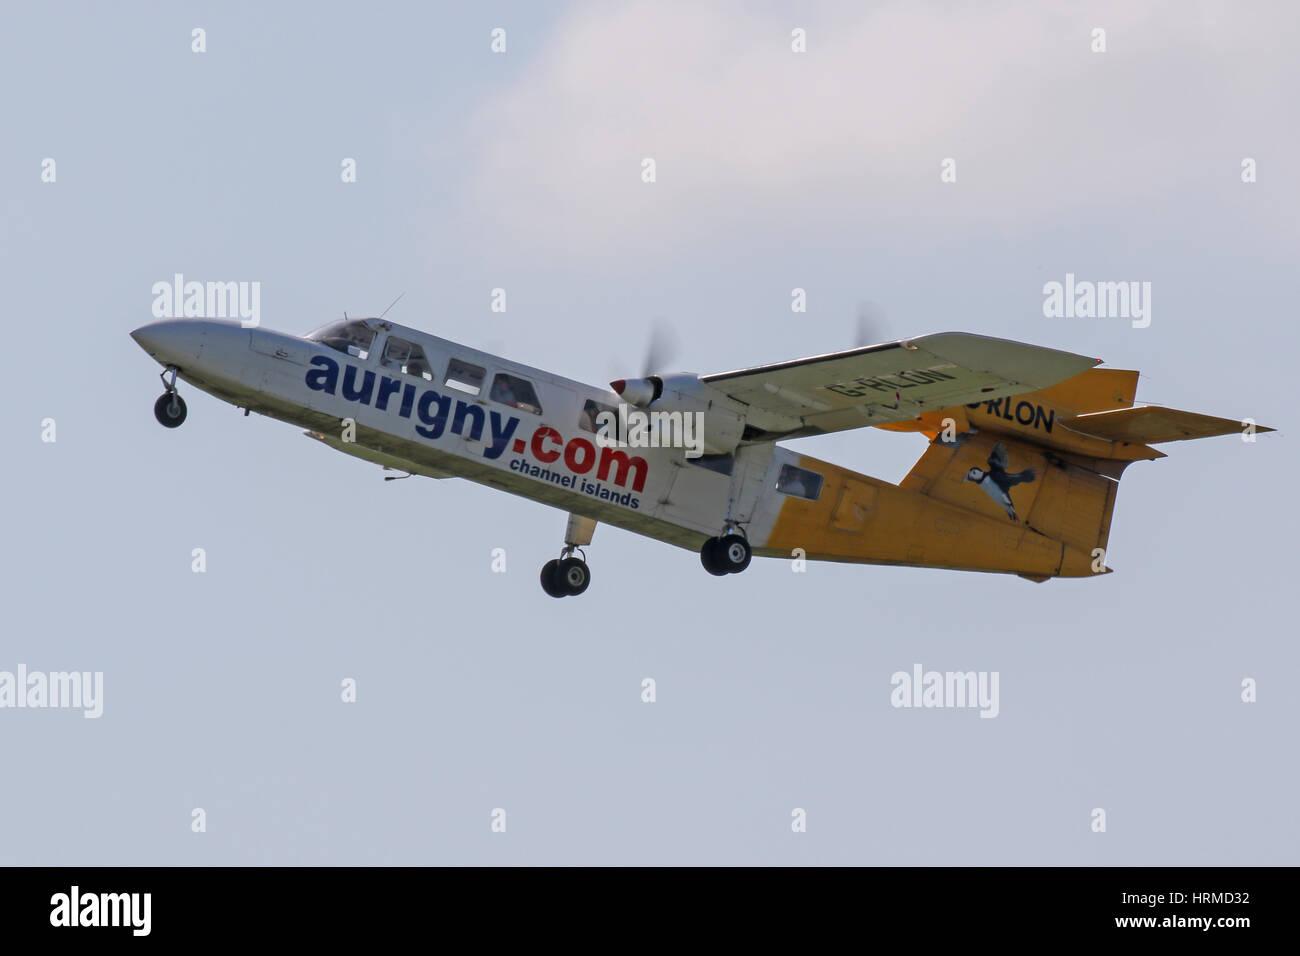 Aurigny Air Services Britten Norman Trislander G-RLON departs Southampton Airport for Alderney - Stock Image